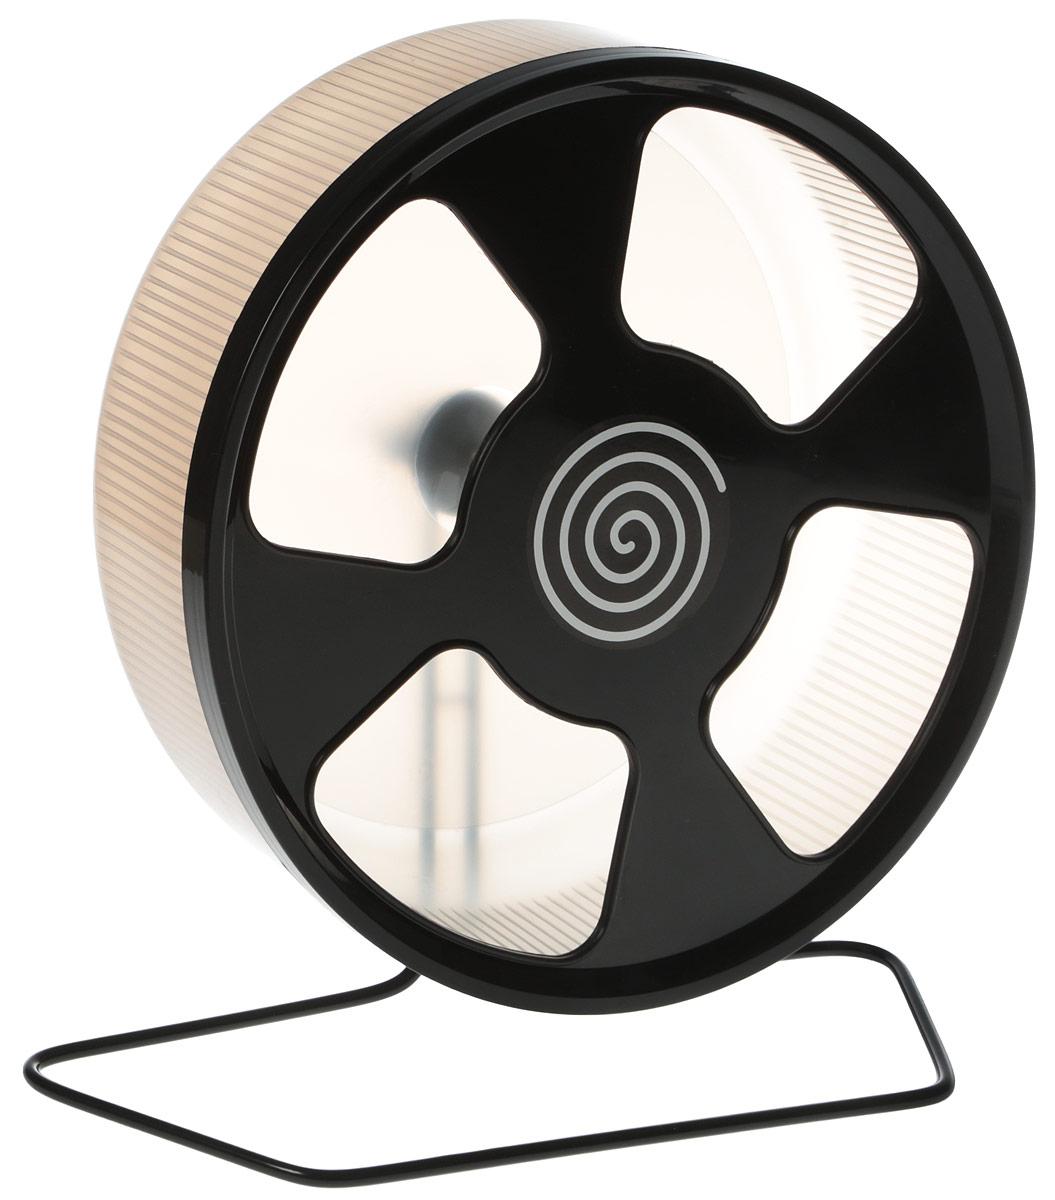 Колесо для грызунов Trixie, на подставке, цвет: серый, черный, диаметр 28 см trixie шлейка trixie для собак размер s m 35 60 см 15 мм синяя